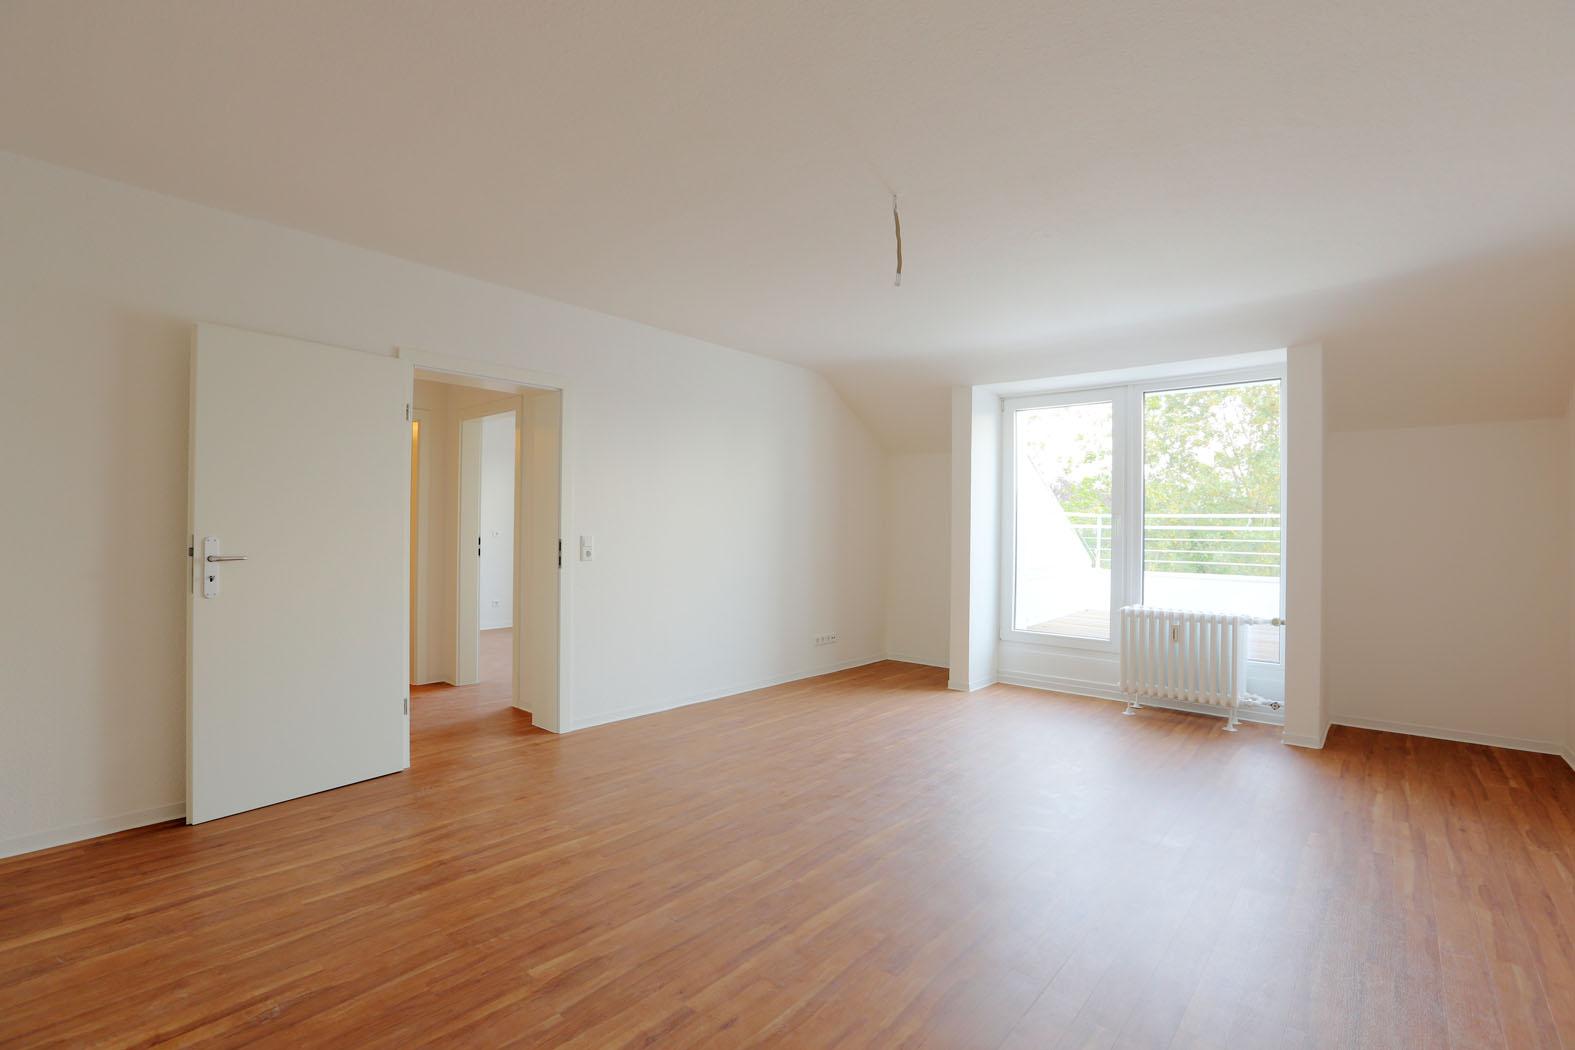 VERKAUFT Sanierte 3 Zimmer Dachgeschosswohnung in Düsseldorf-Düsseltal